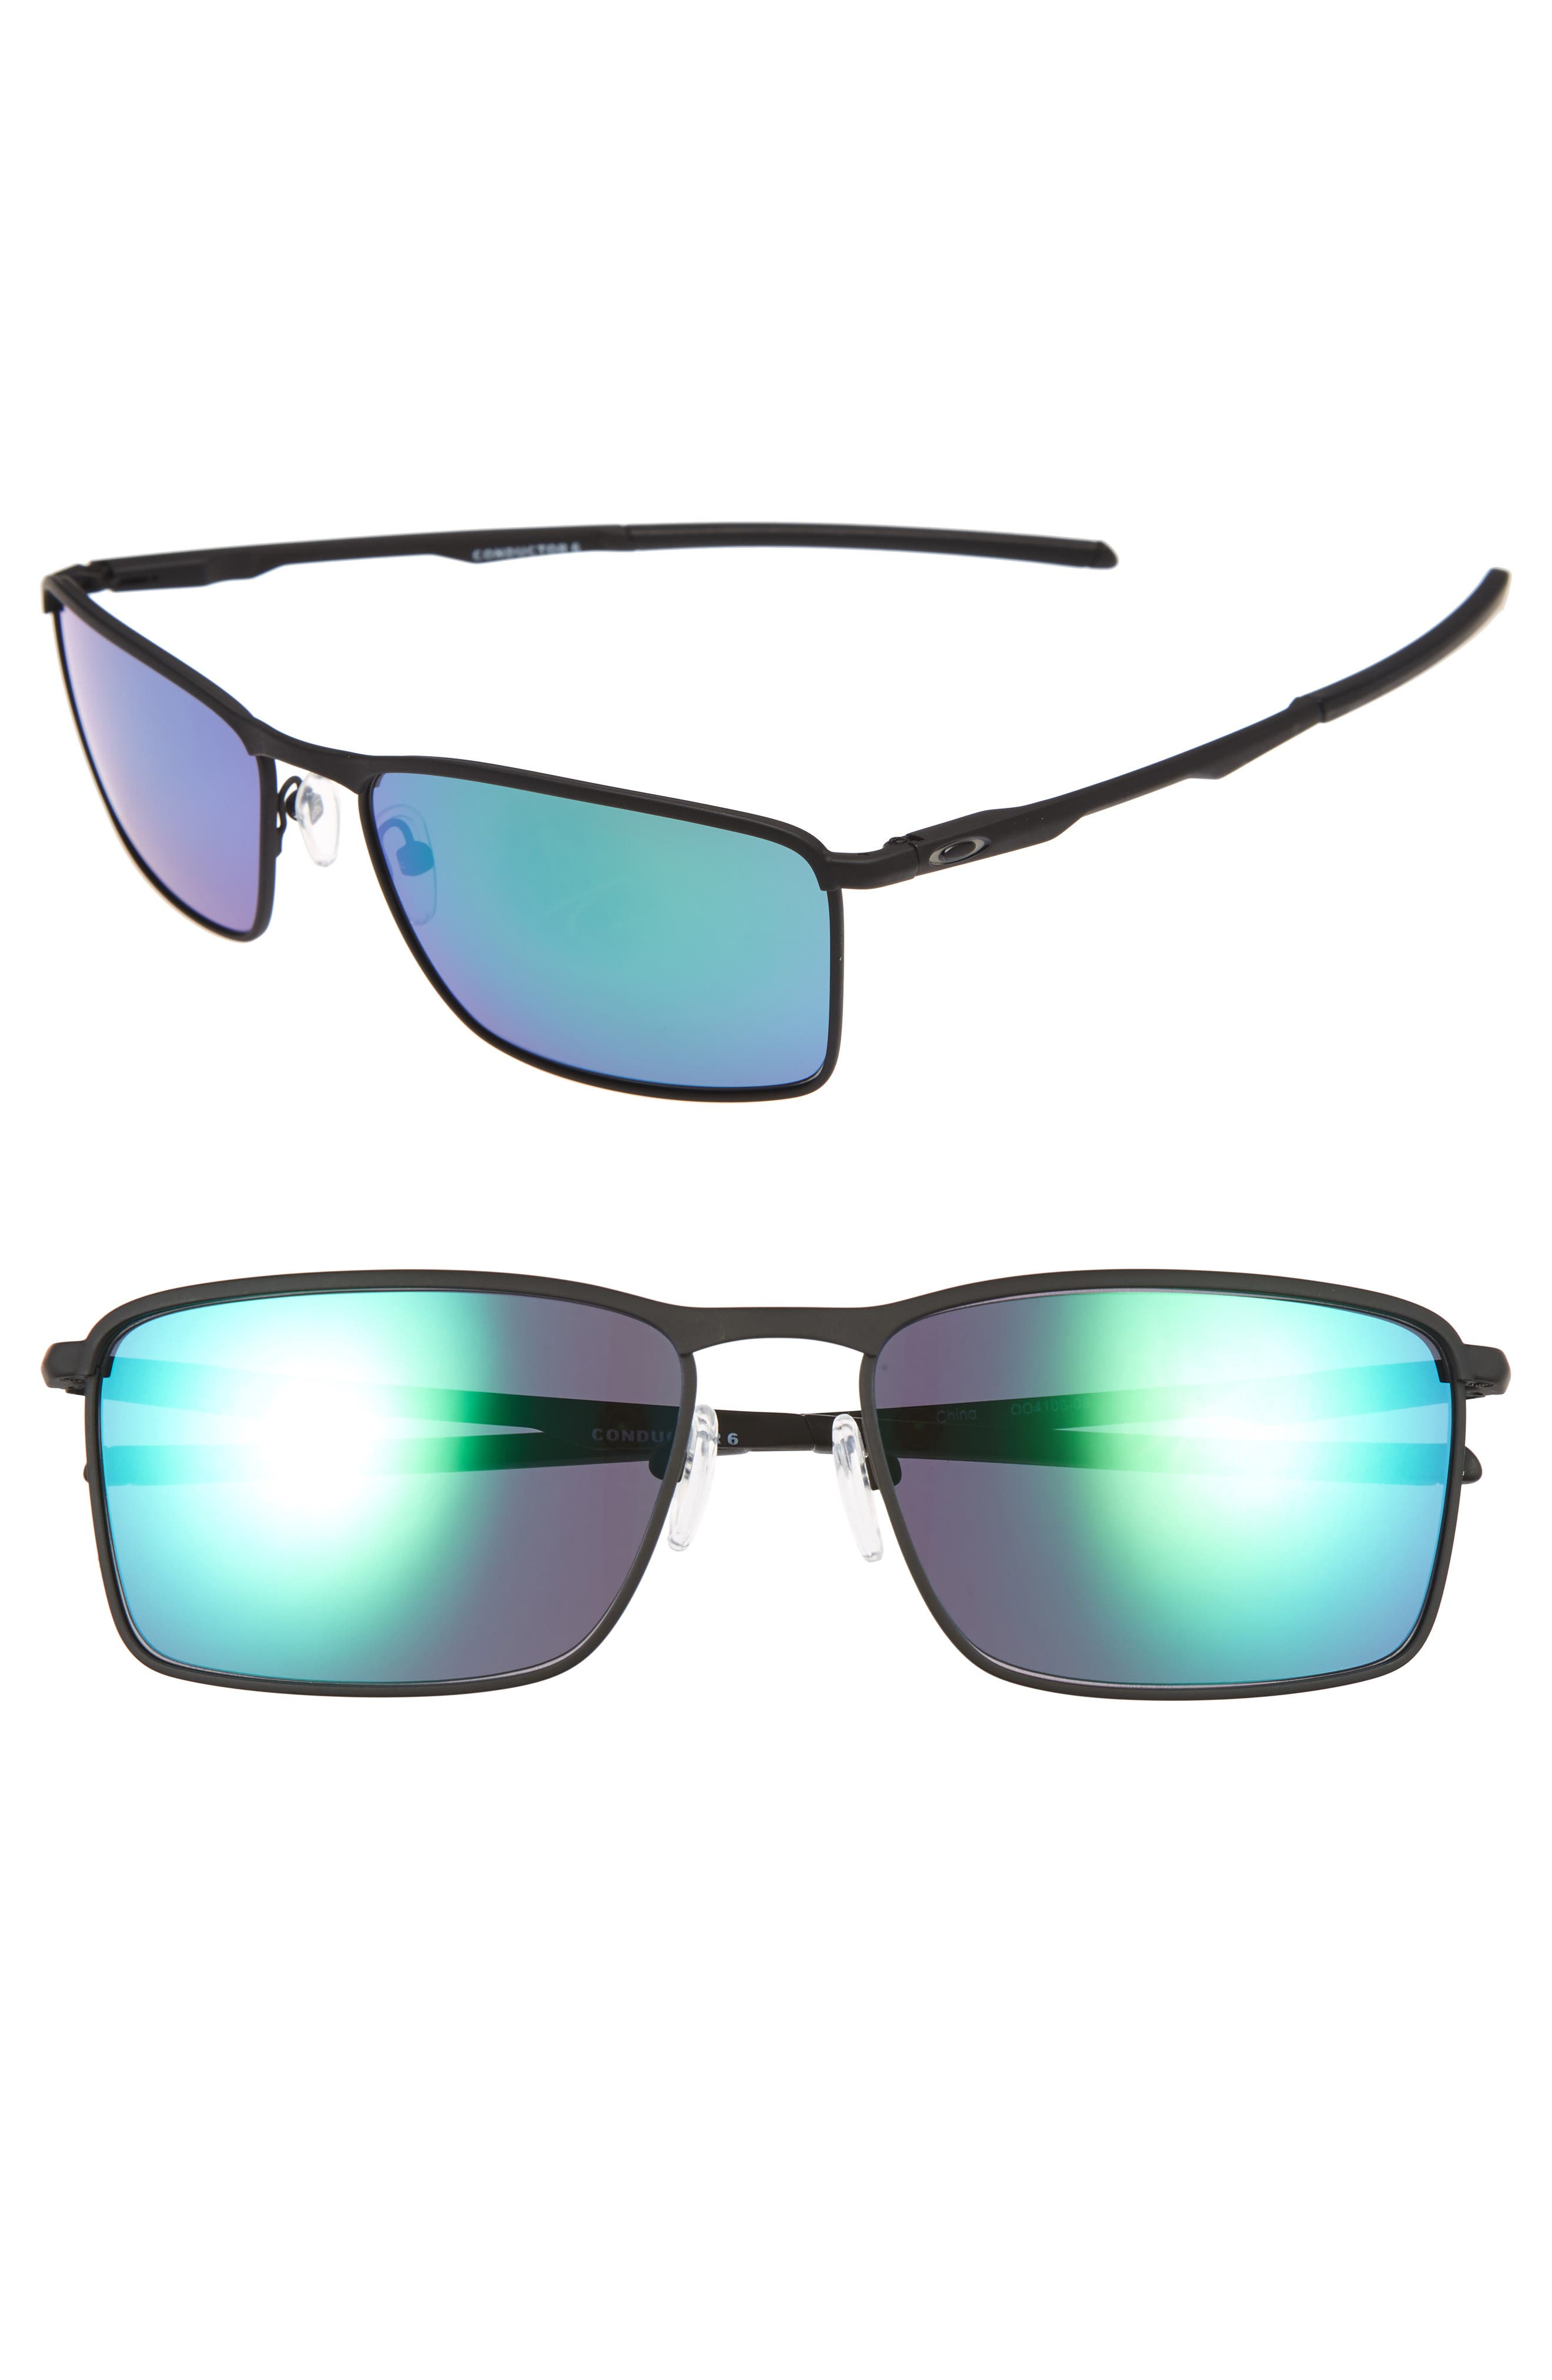 Conductor 6 58mm Polarized Sunglasses,                         Main,                         color, 001